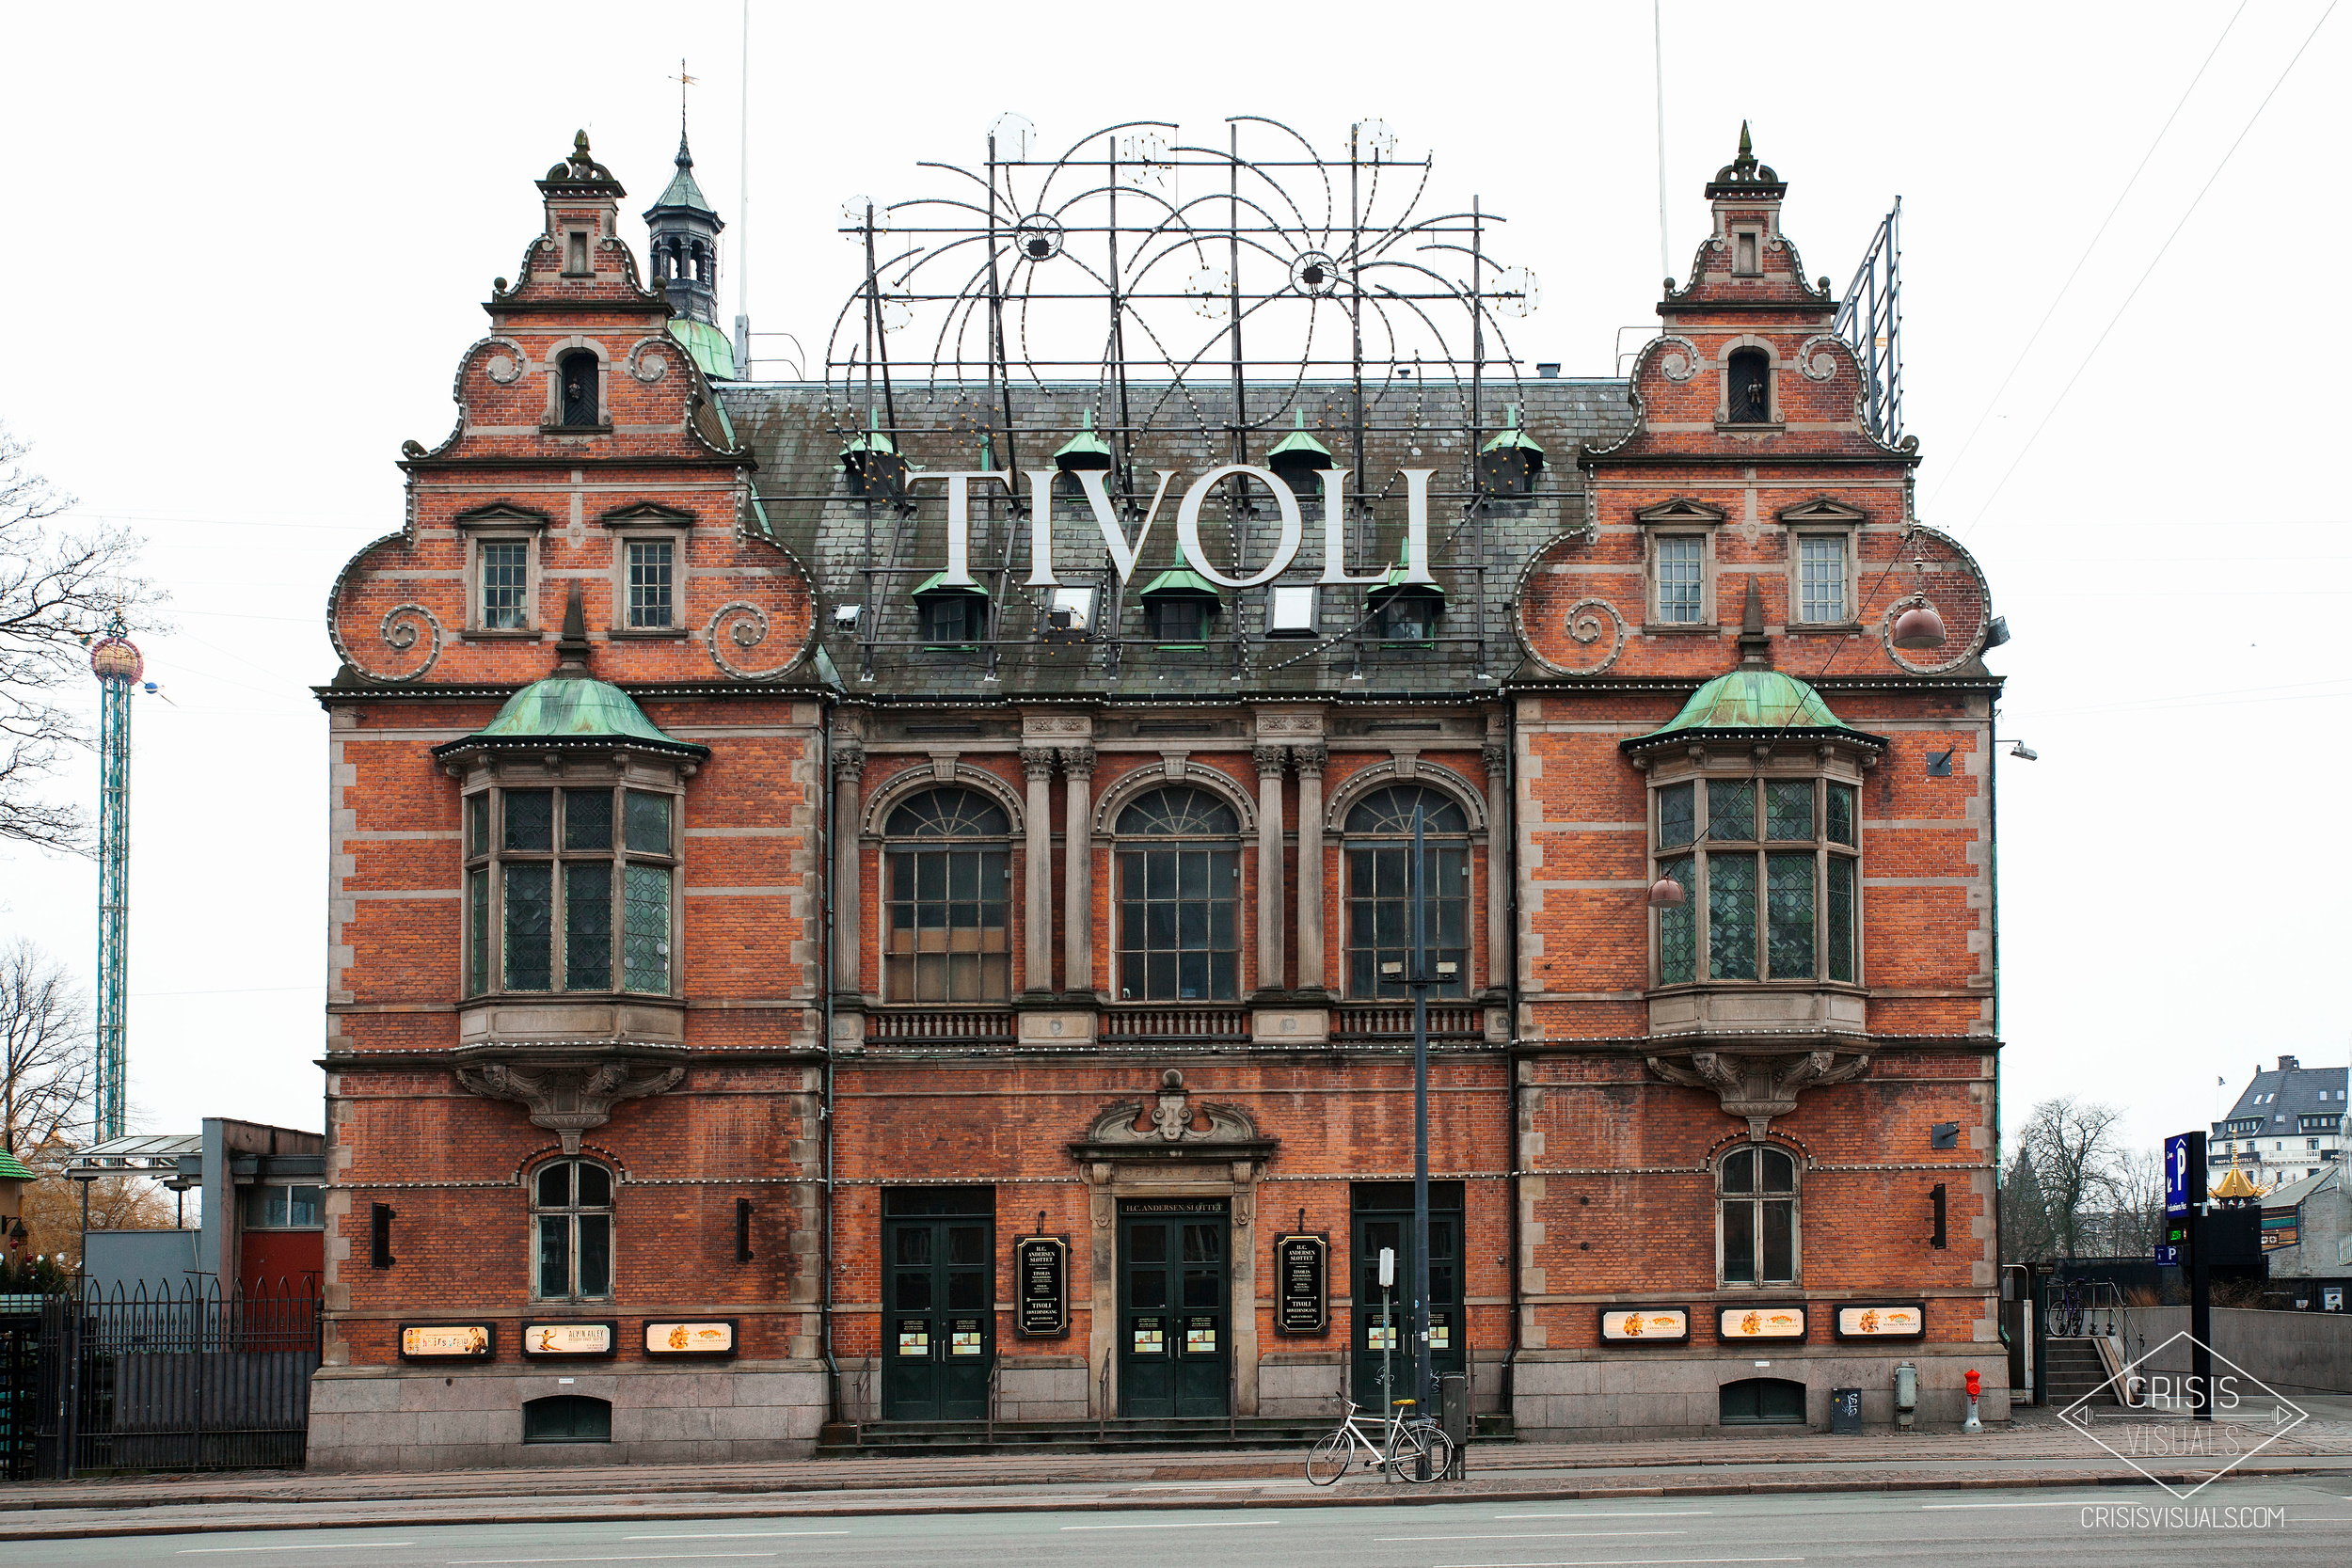 Tivoli's Offices